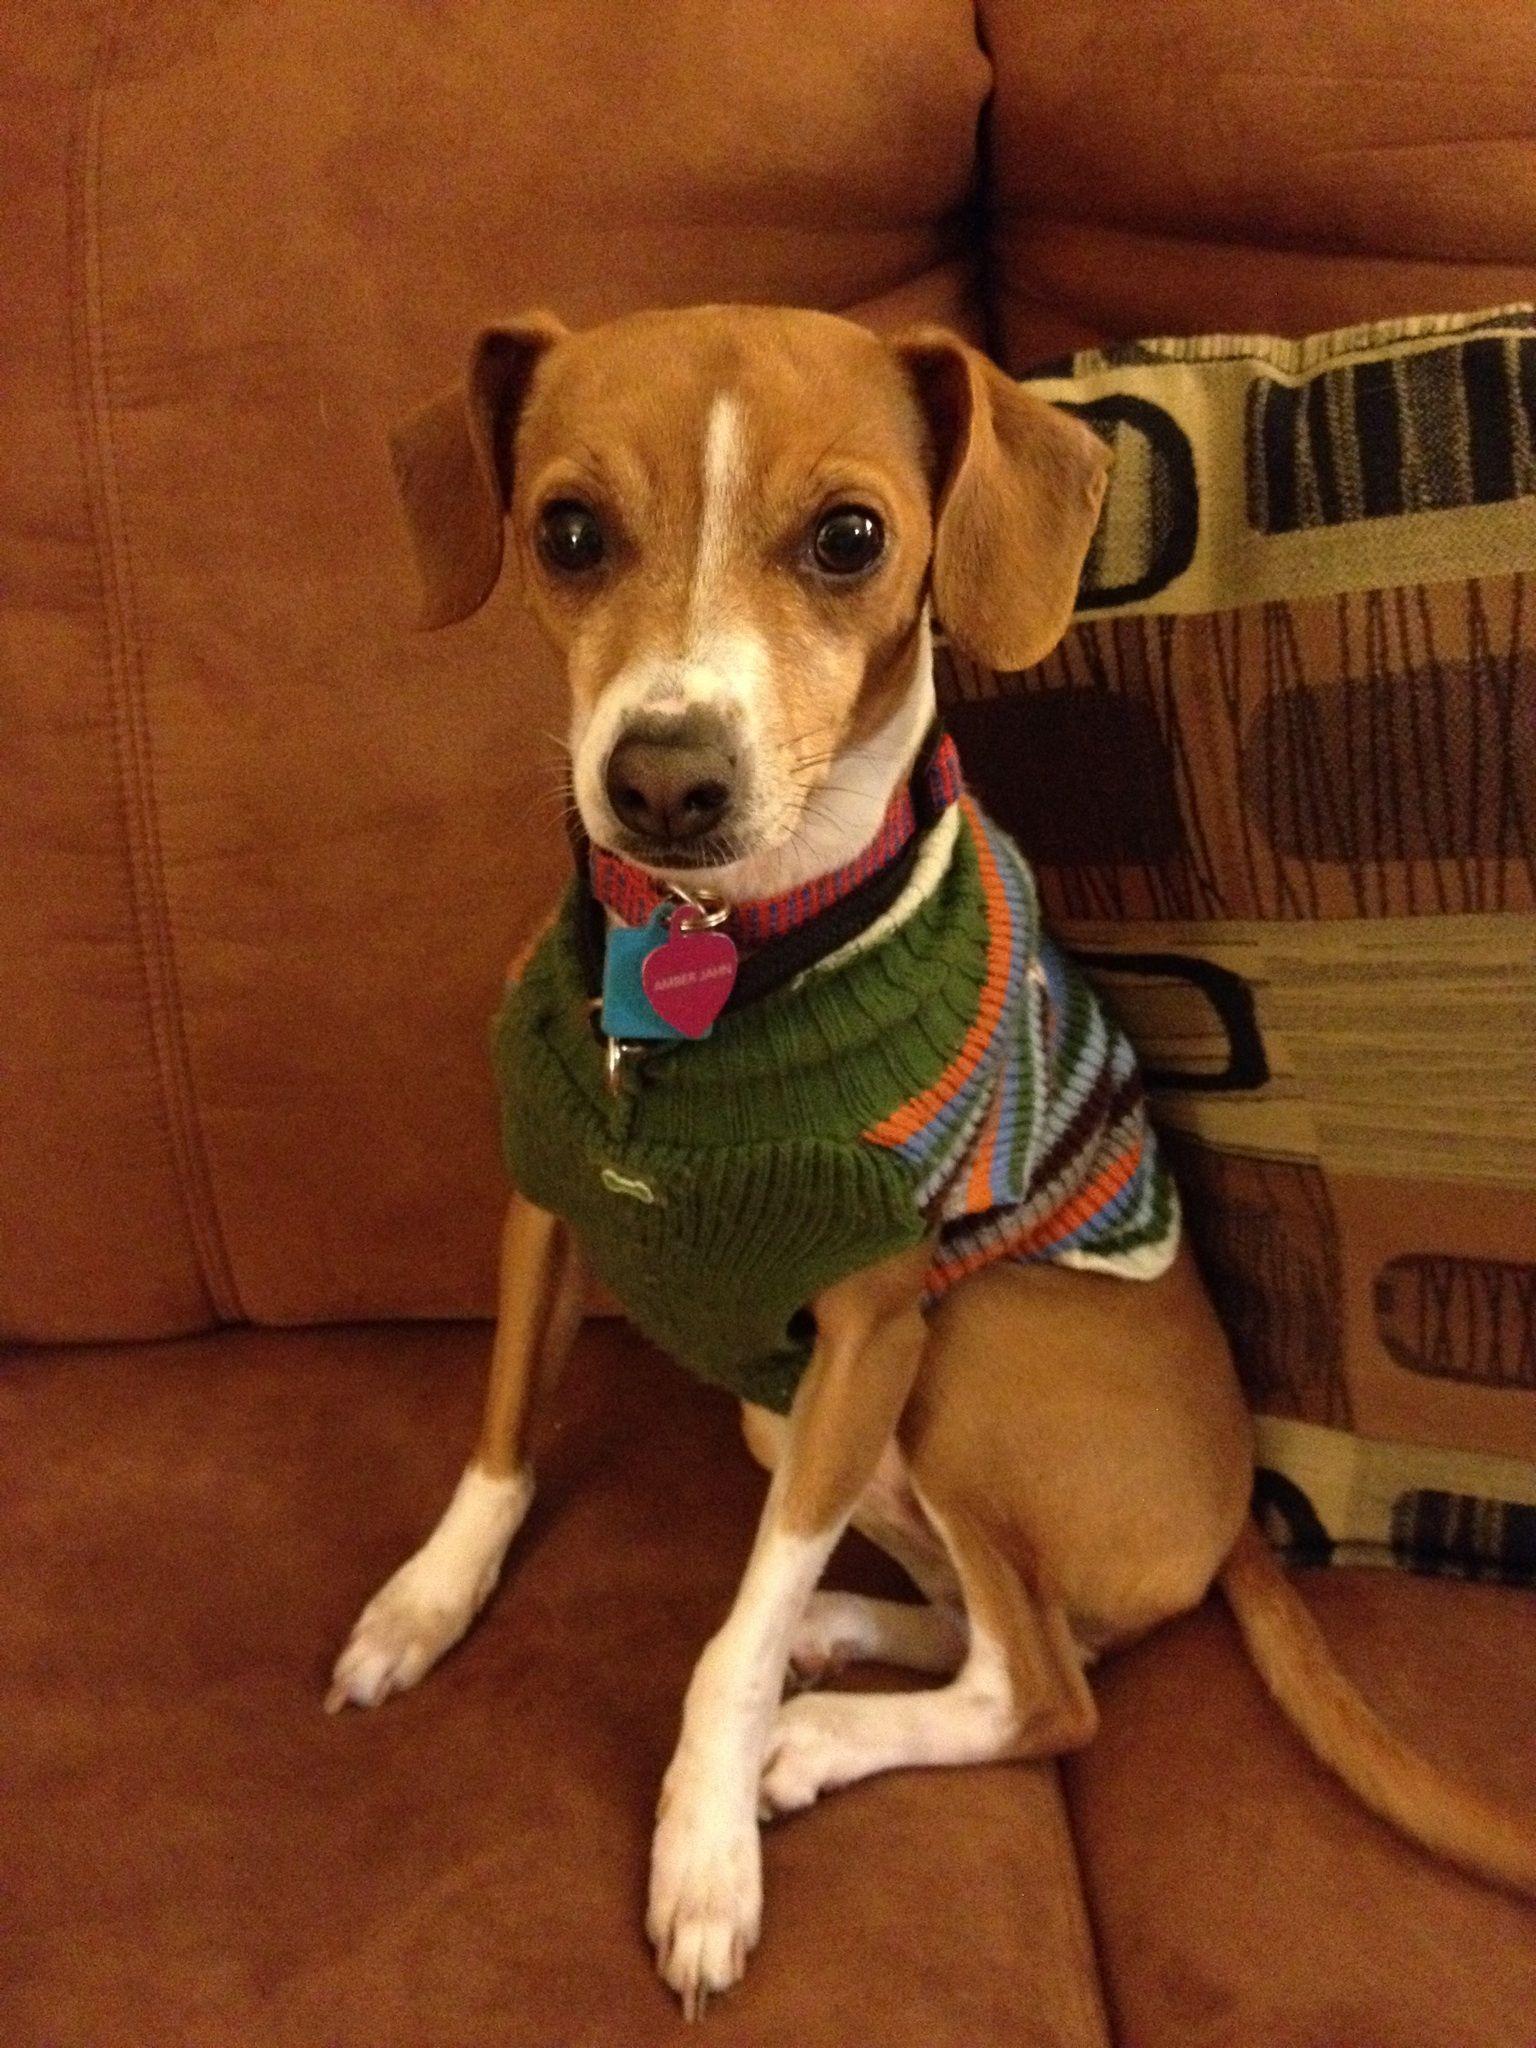 Italian Greyhound Beagle My Baby Girl Amber Beagle Puppies